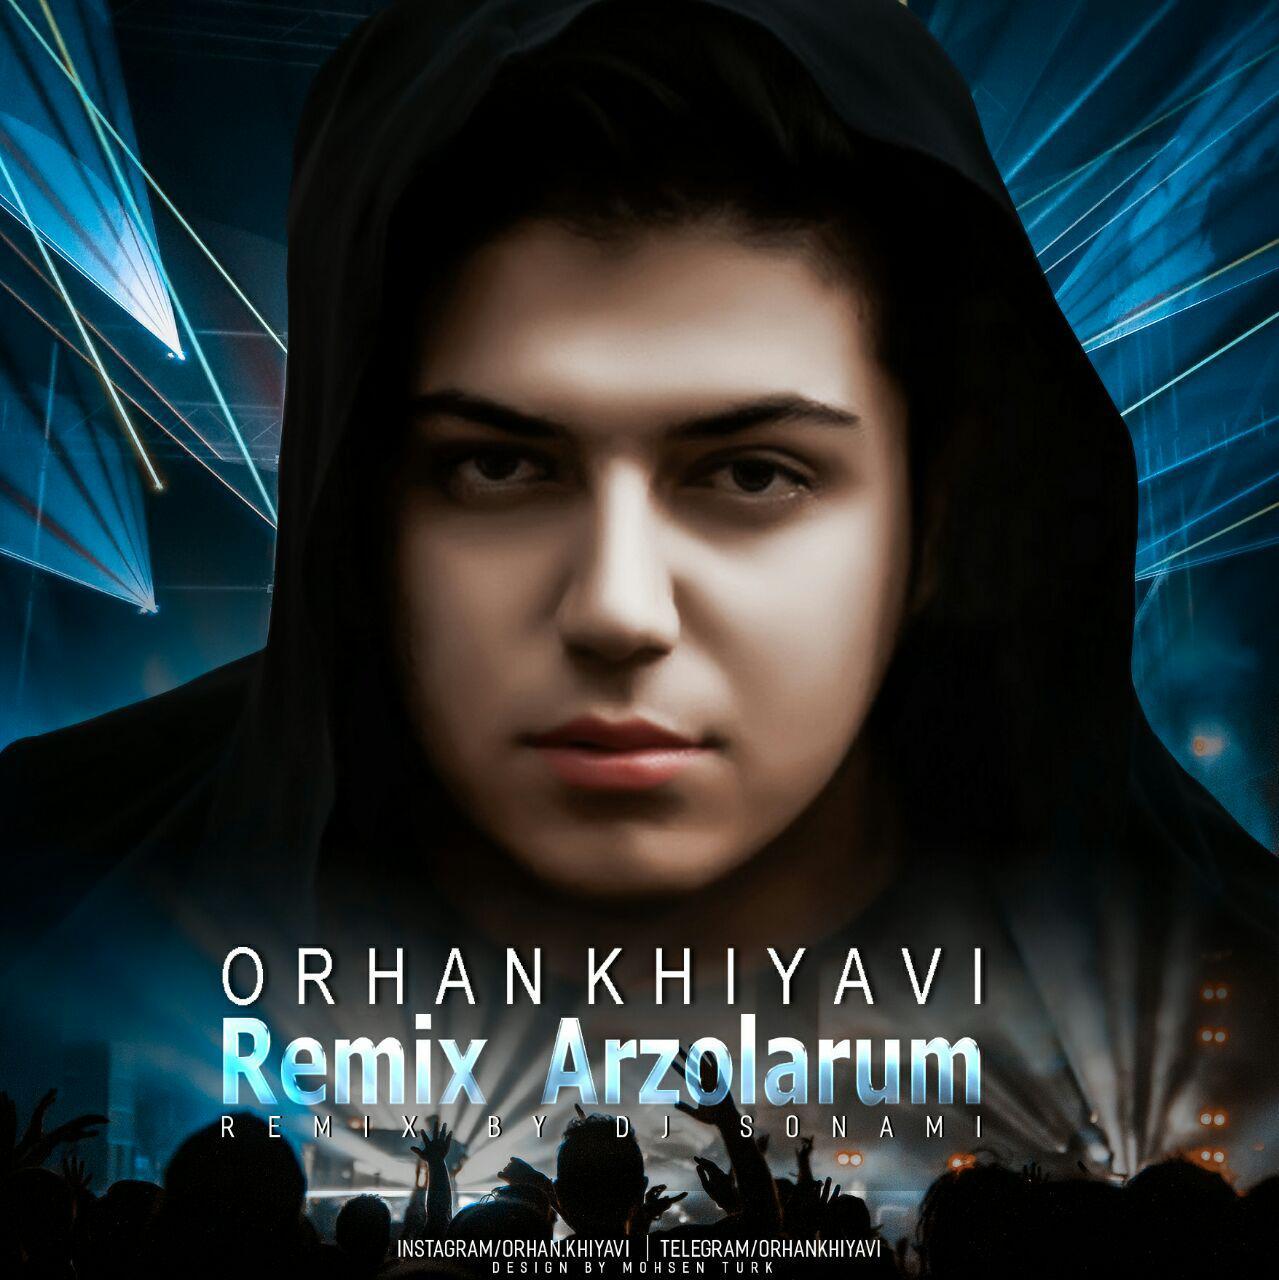 http://s8.picofile.com/file/8336923368/29Orhan_Khiyavi_Arzolarum_Remix_.jpg